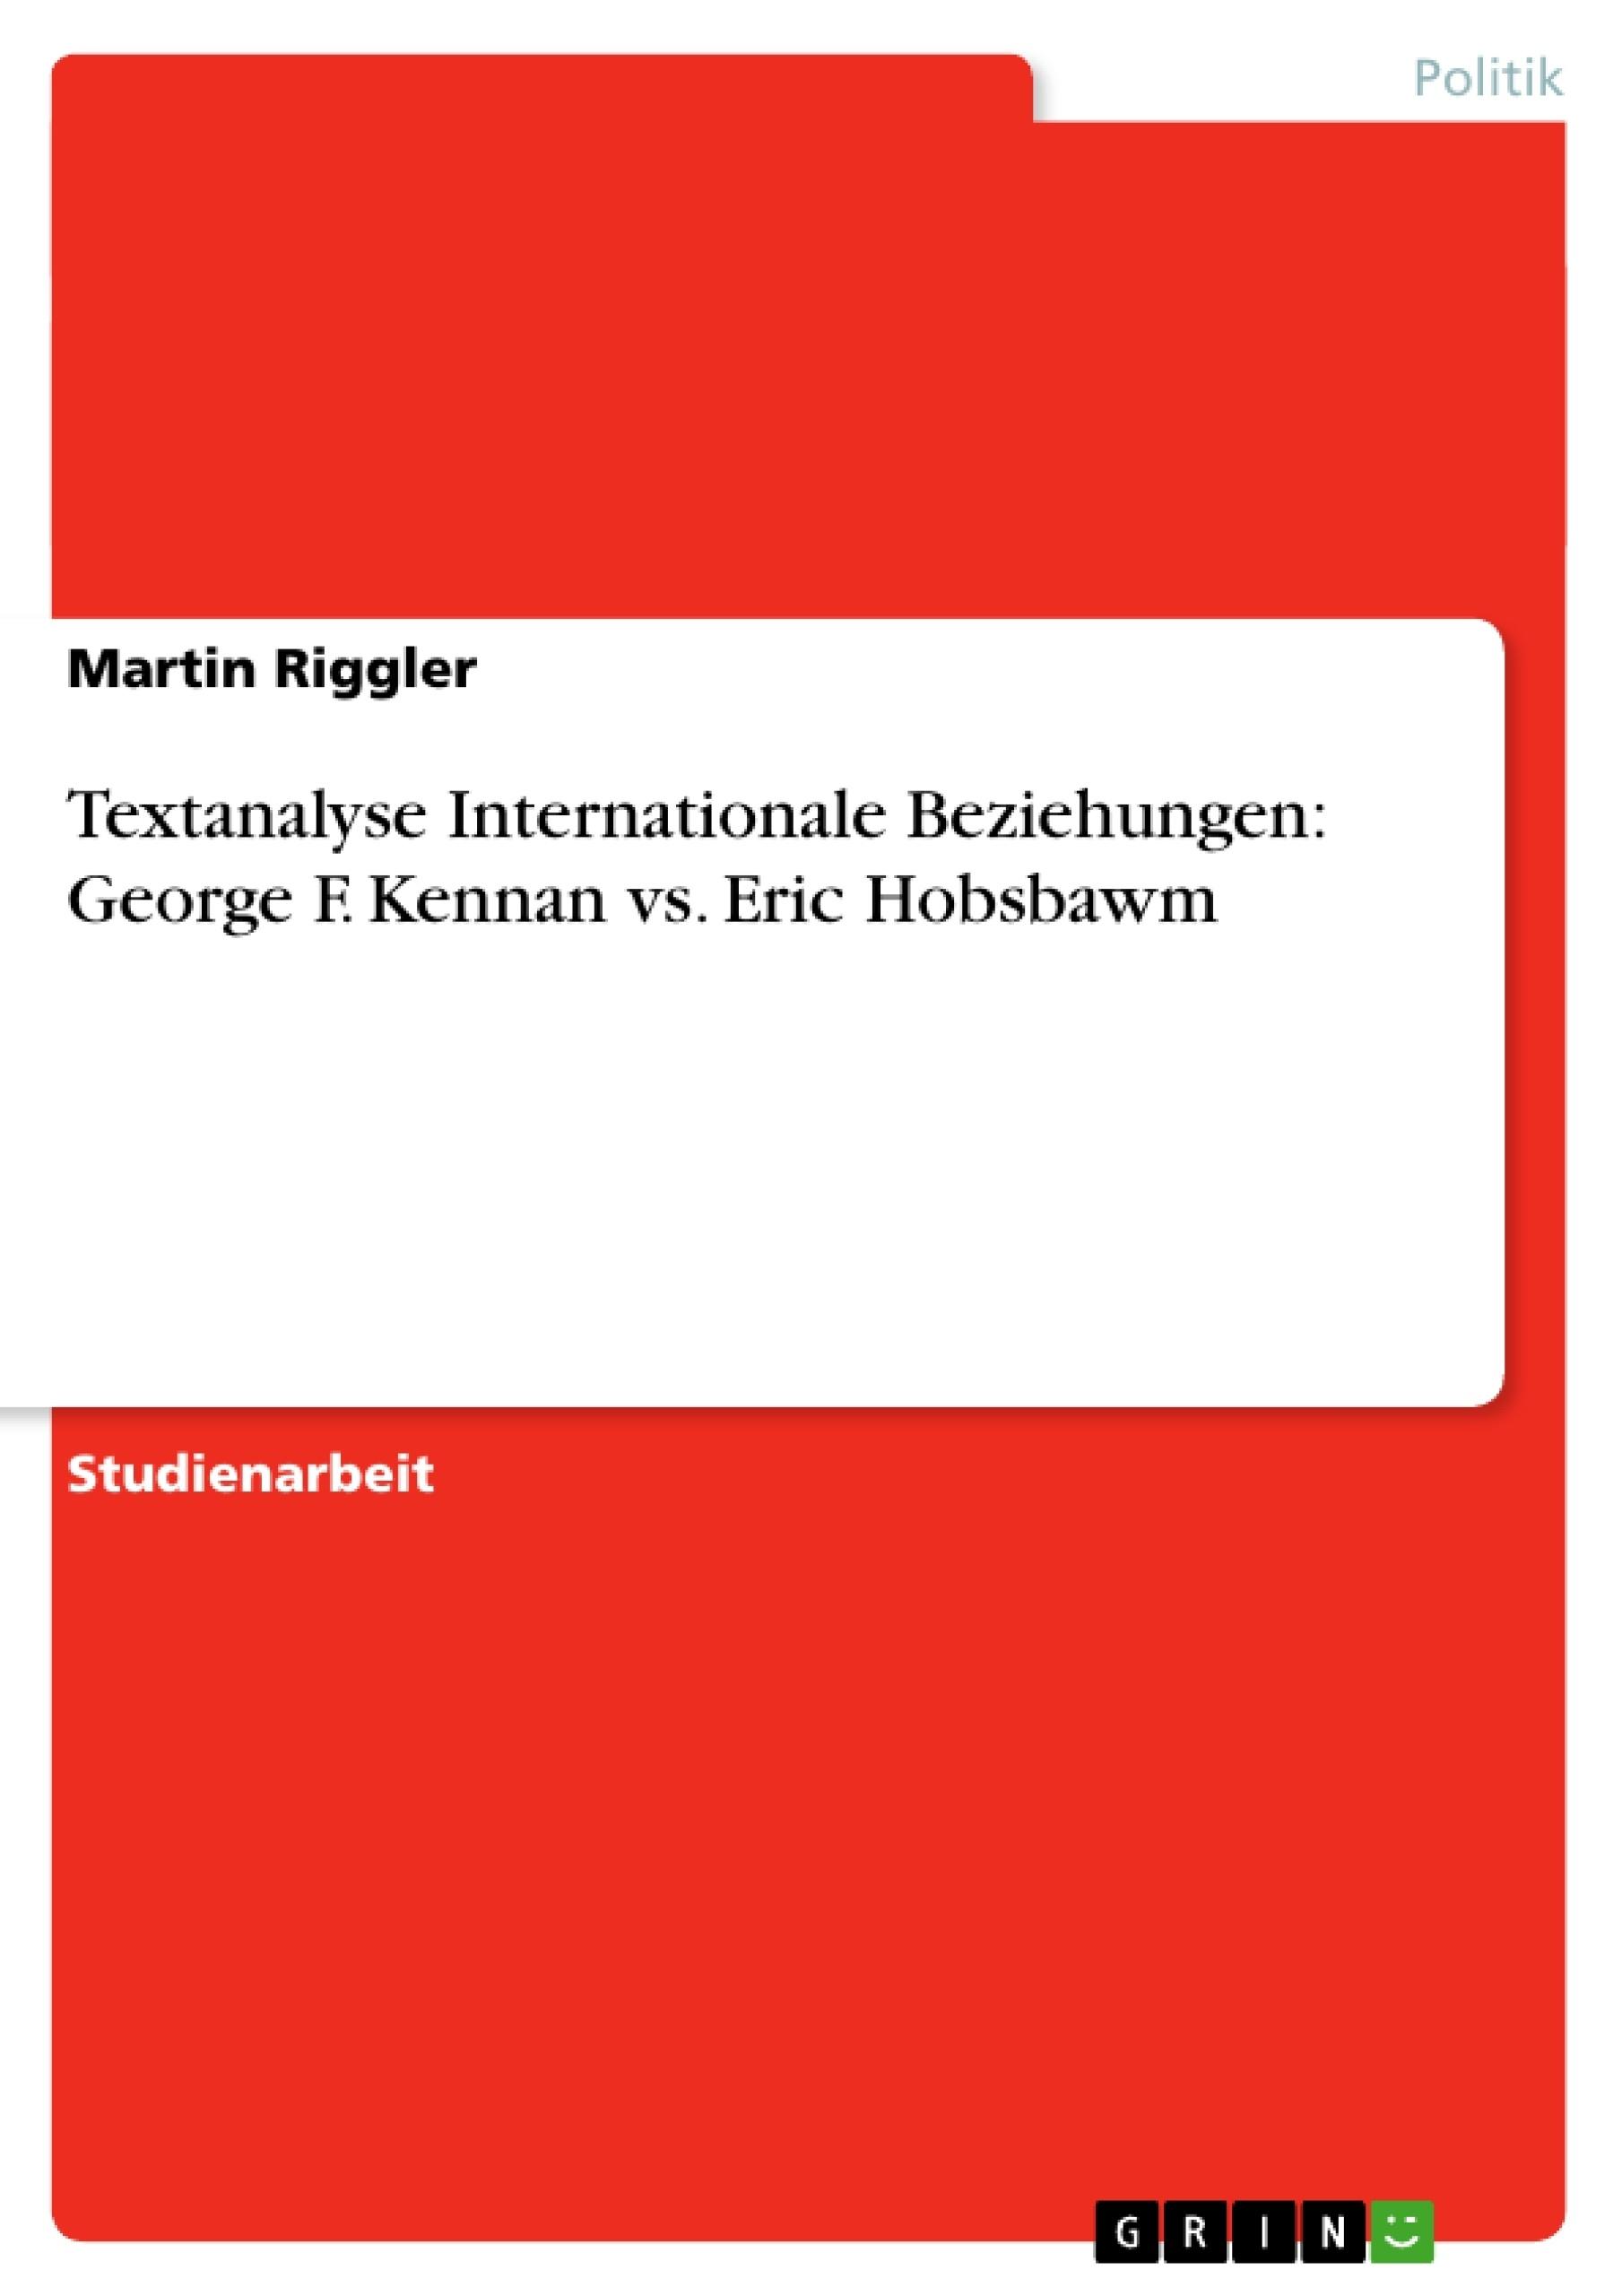 Titel: Textanalyse Internationale Beziehungen: George F. Kennan vs. Eric Hobsbawm